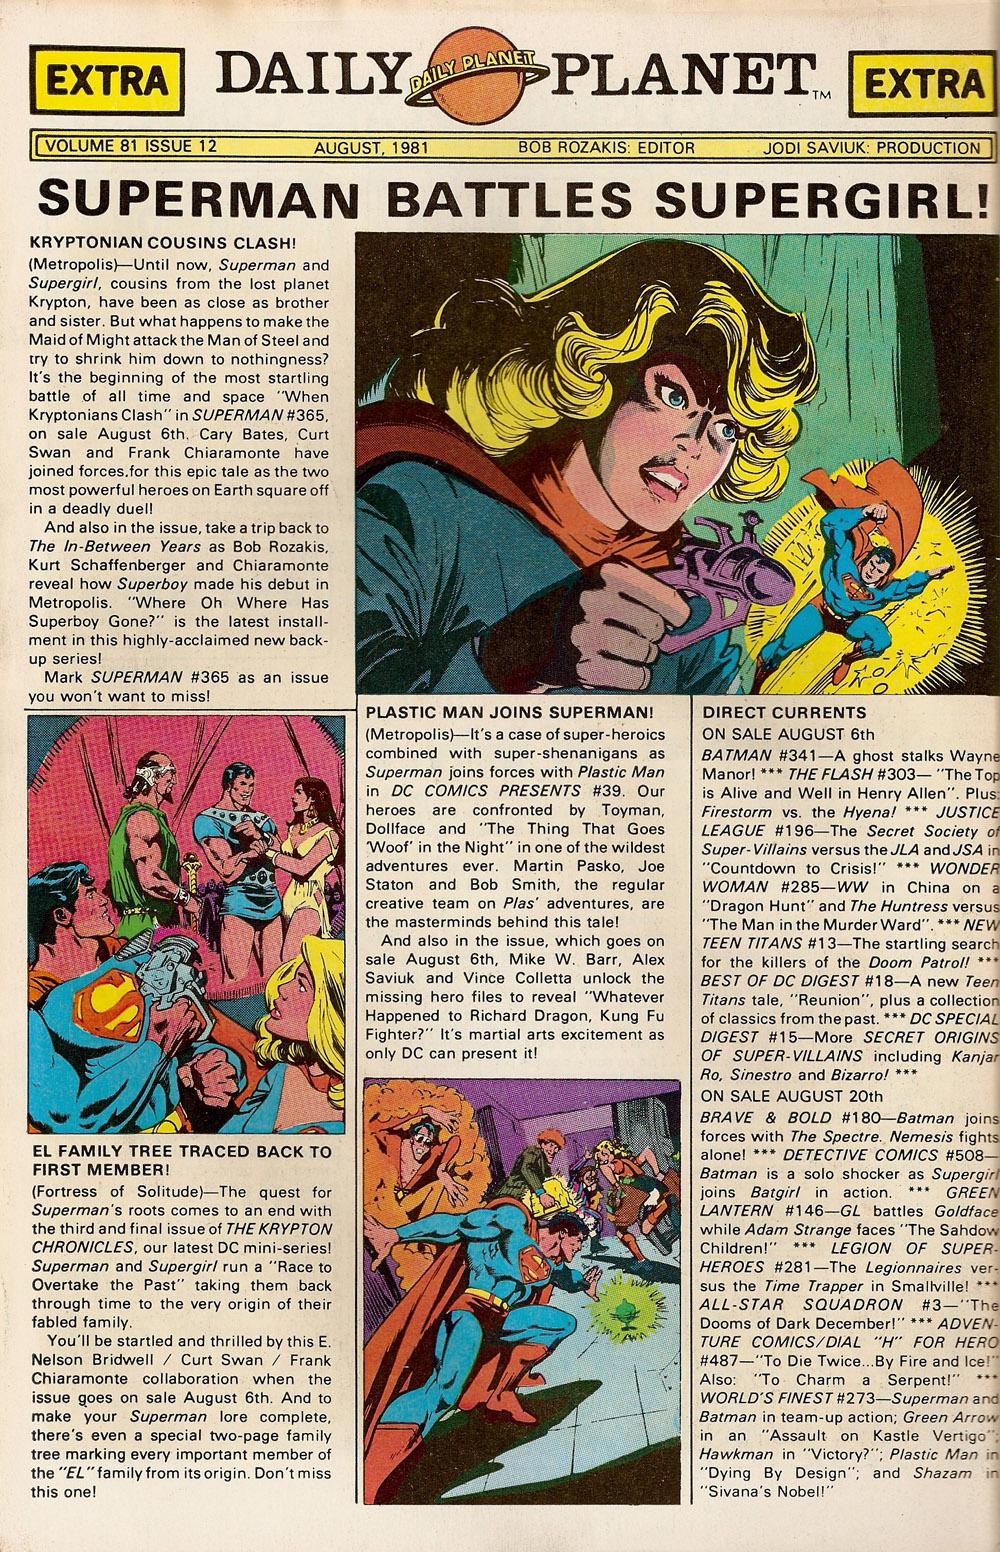 Jonah jameson quotes quotesgram - Daily Planet Superman 06